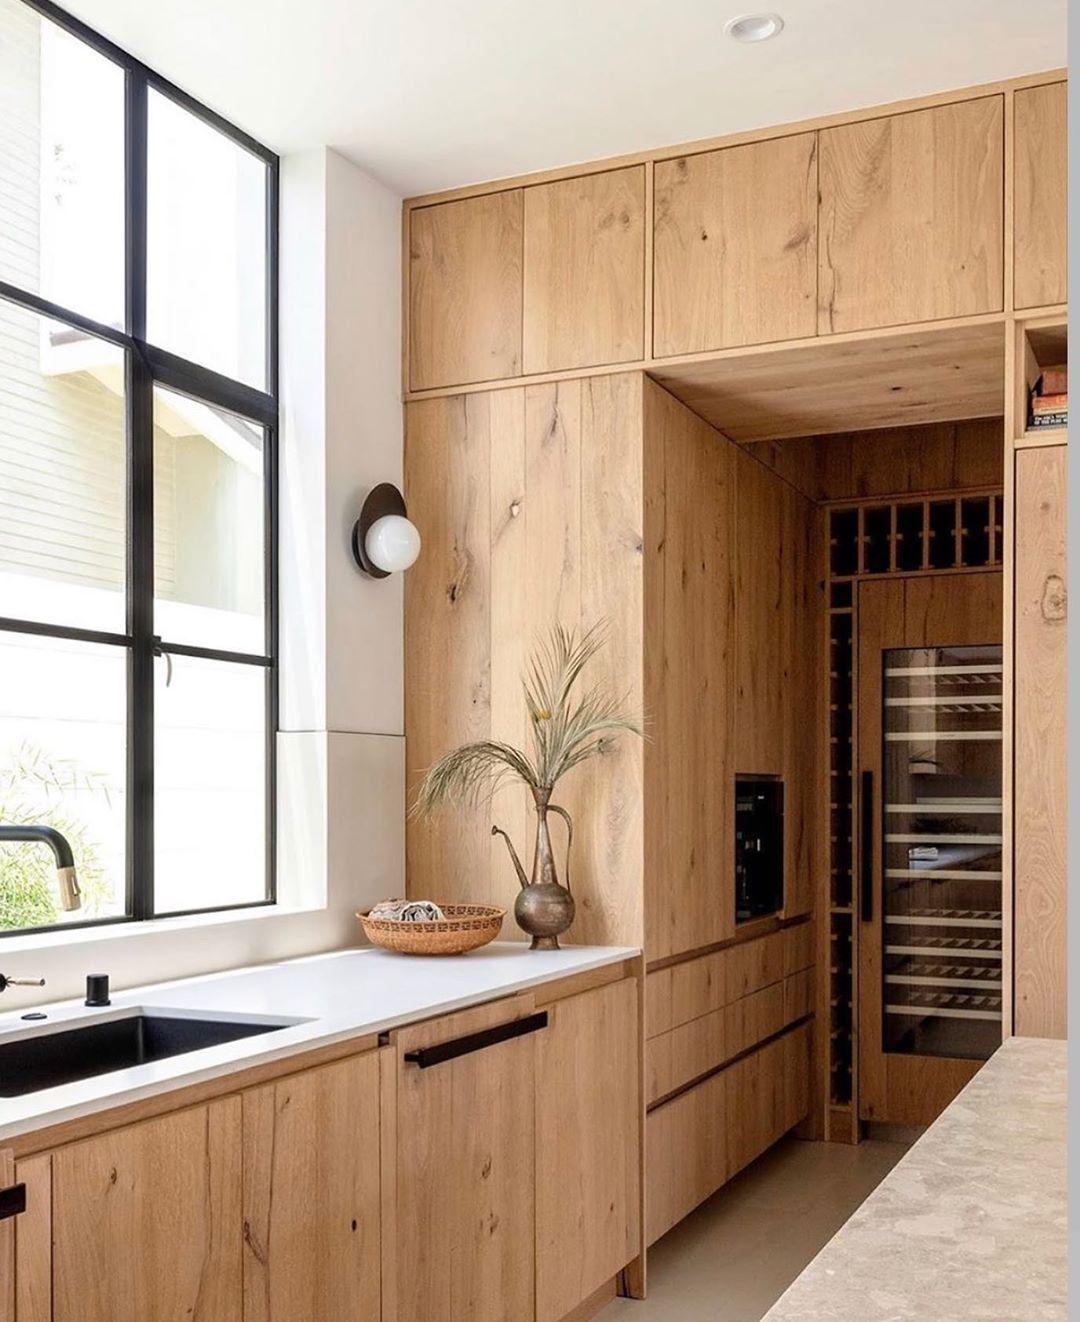 3 514 Likes 54 Comments Cedar Moss Cedarandmoss On Instagram Unbelievably Beautiful Design By Kuskin In 2020 Kitchen Interior Loft Kitchen White Oak Kitchen